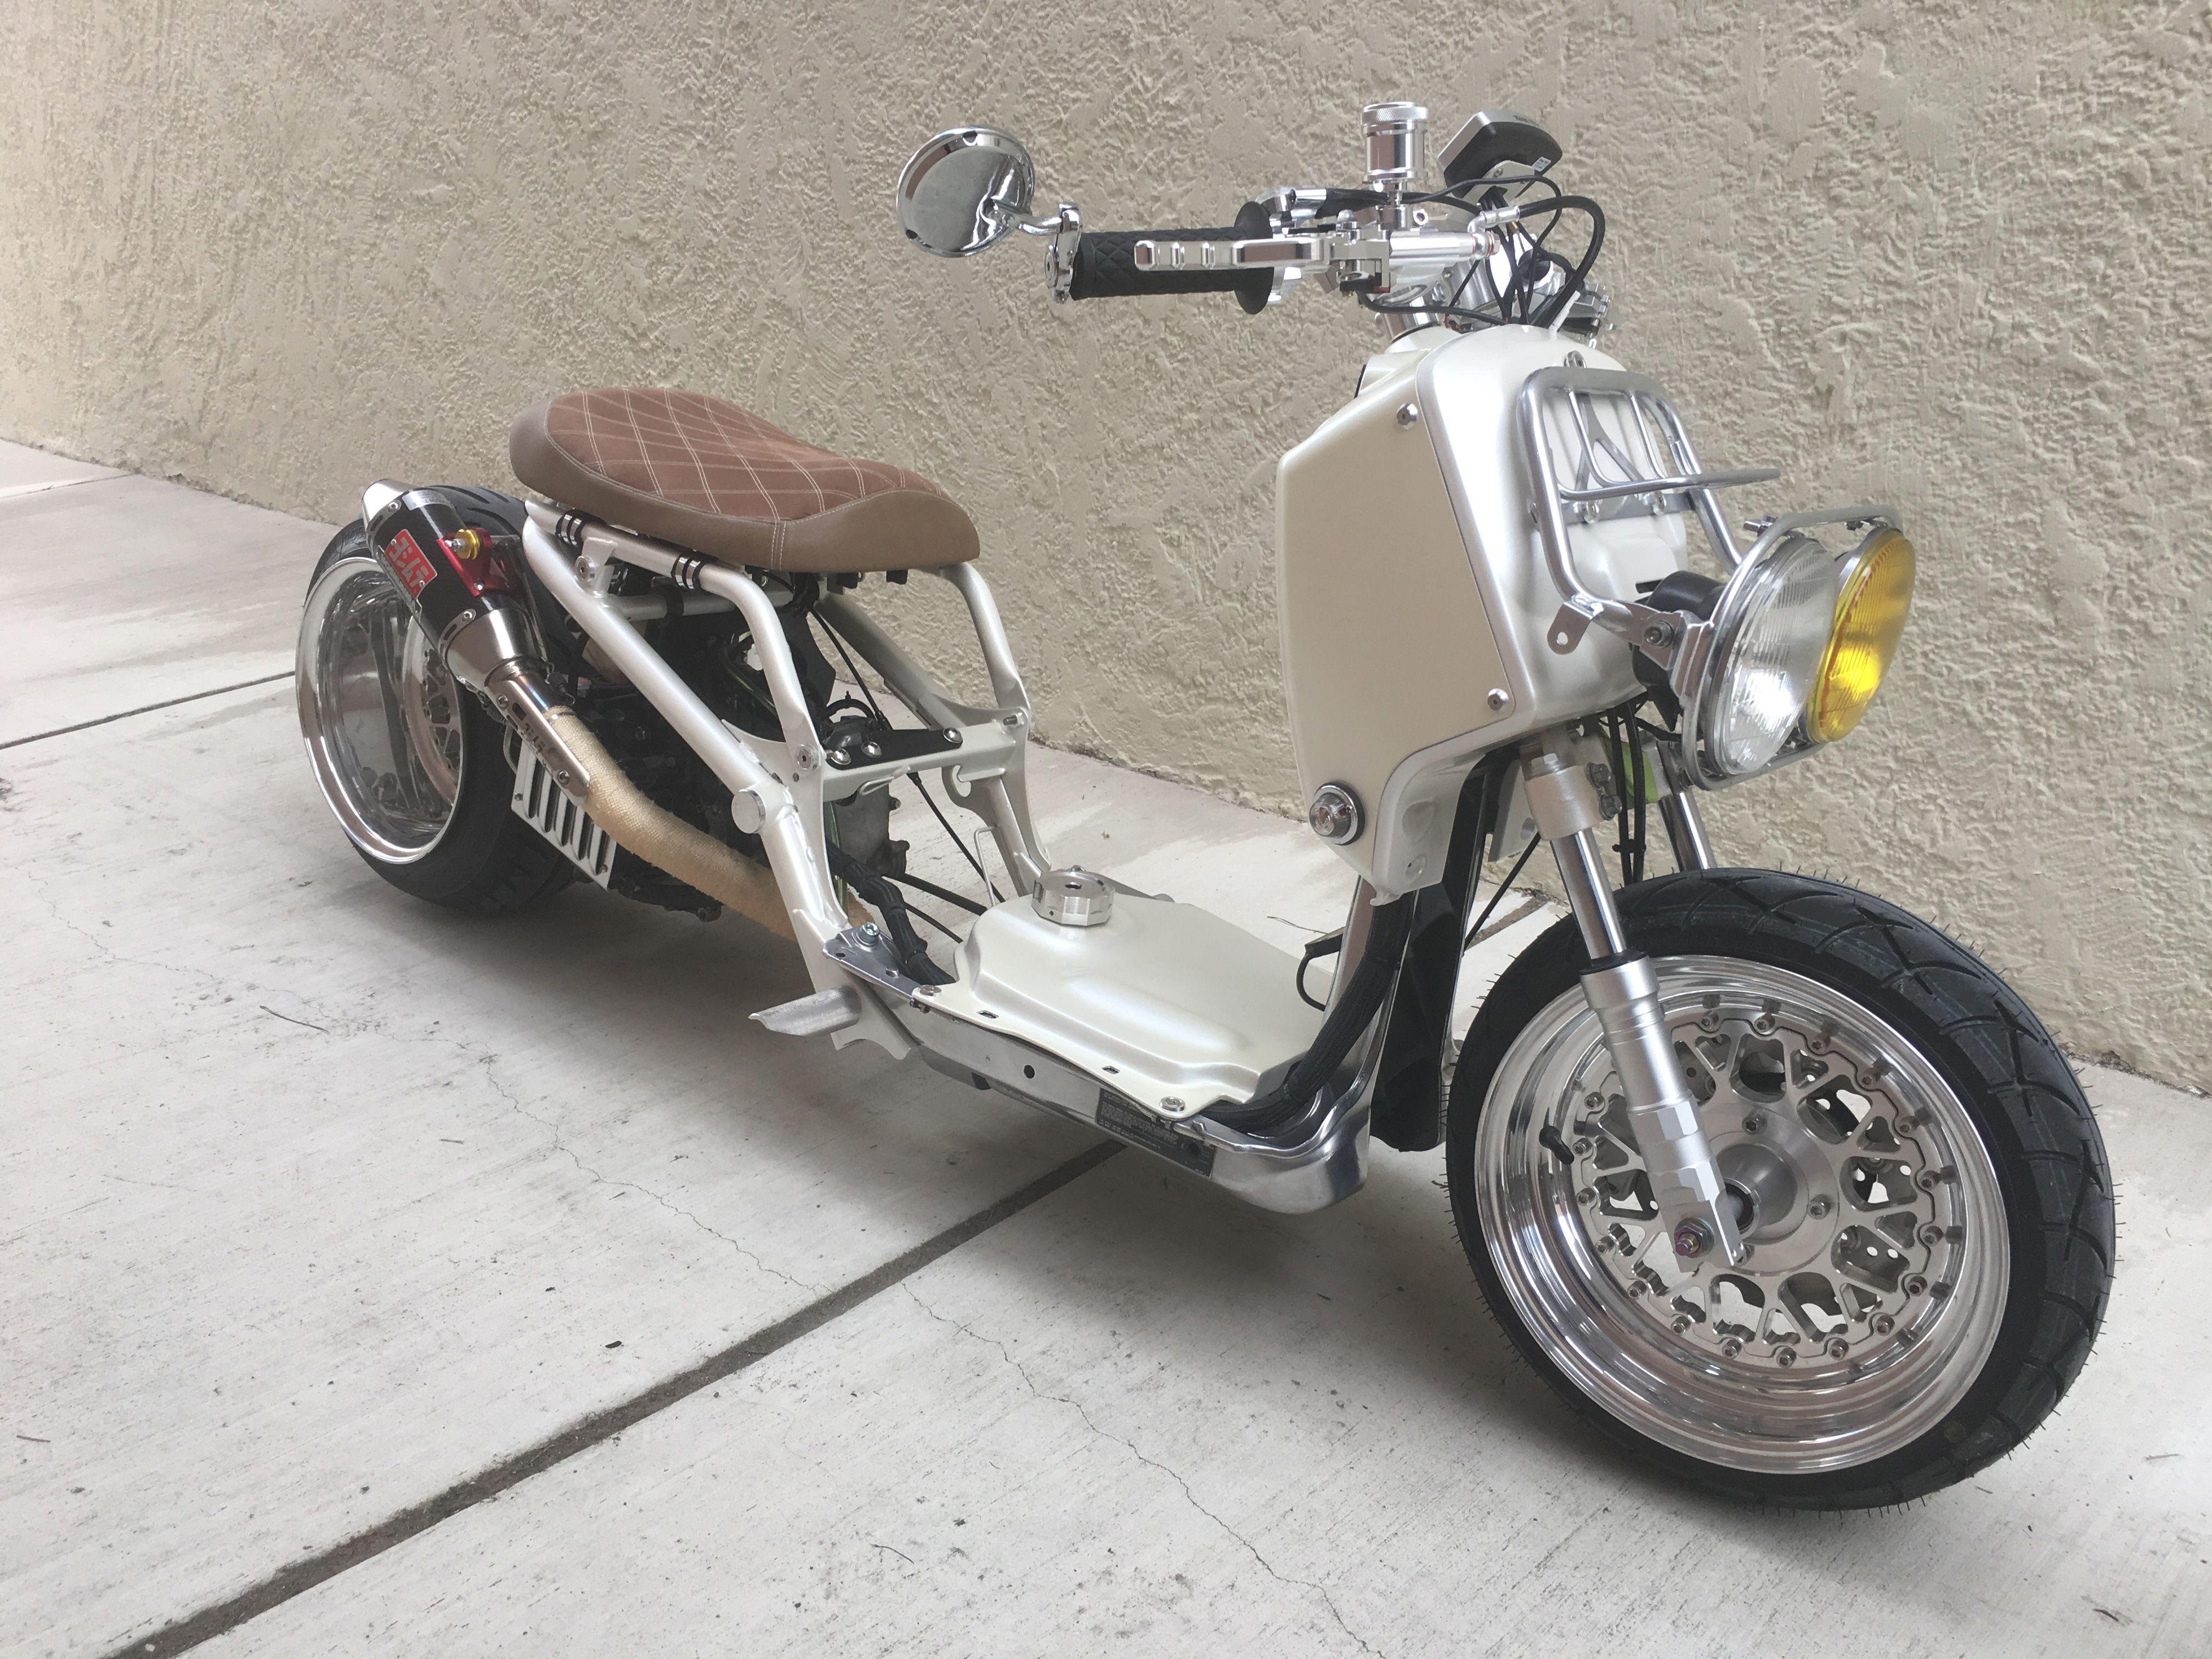 Honda Ruckus 50cc Honda ruckus, Motorcycle, Honda